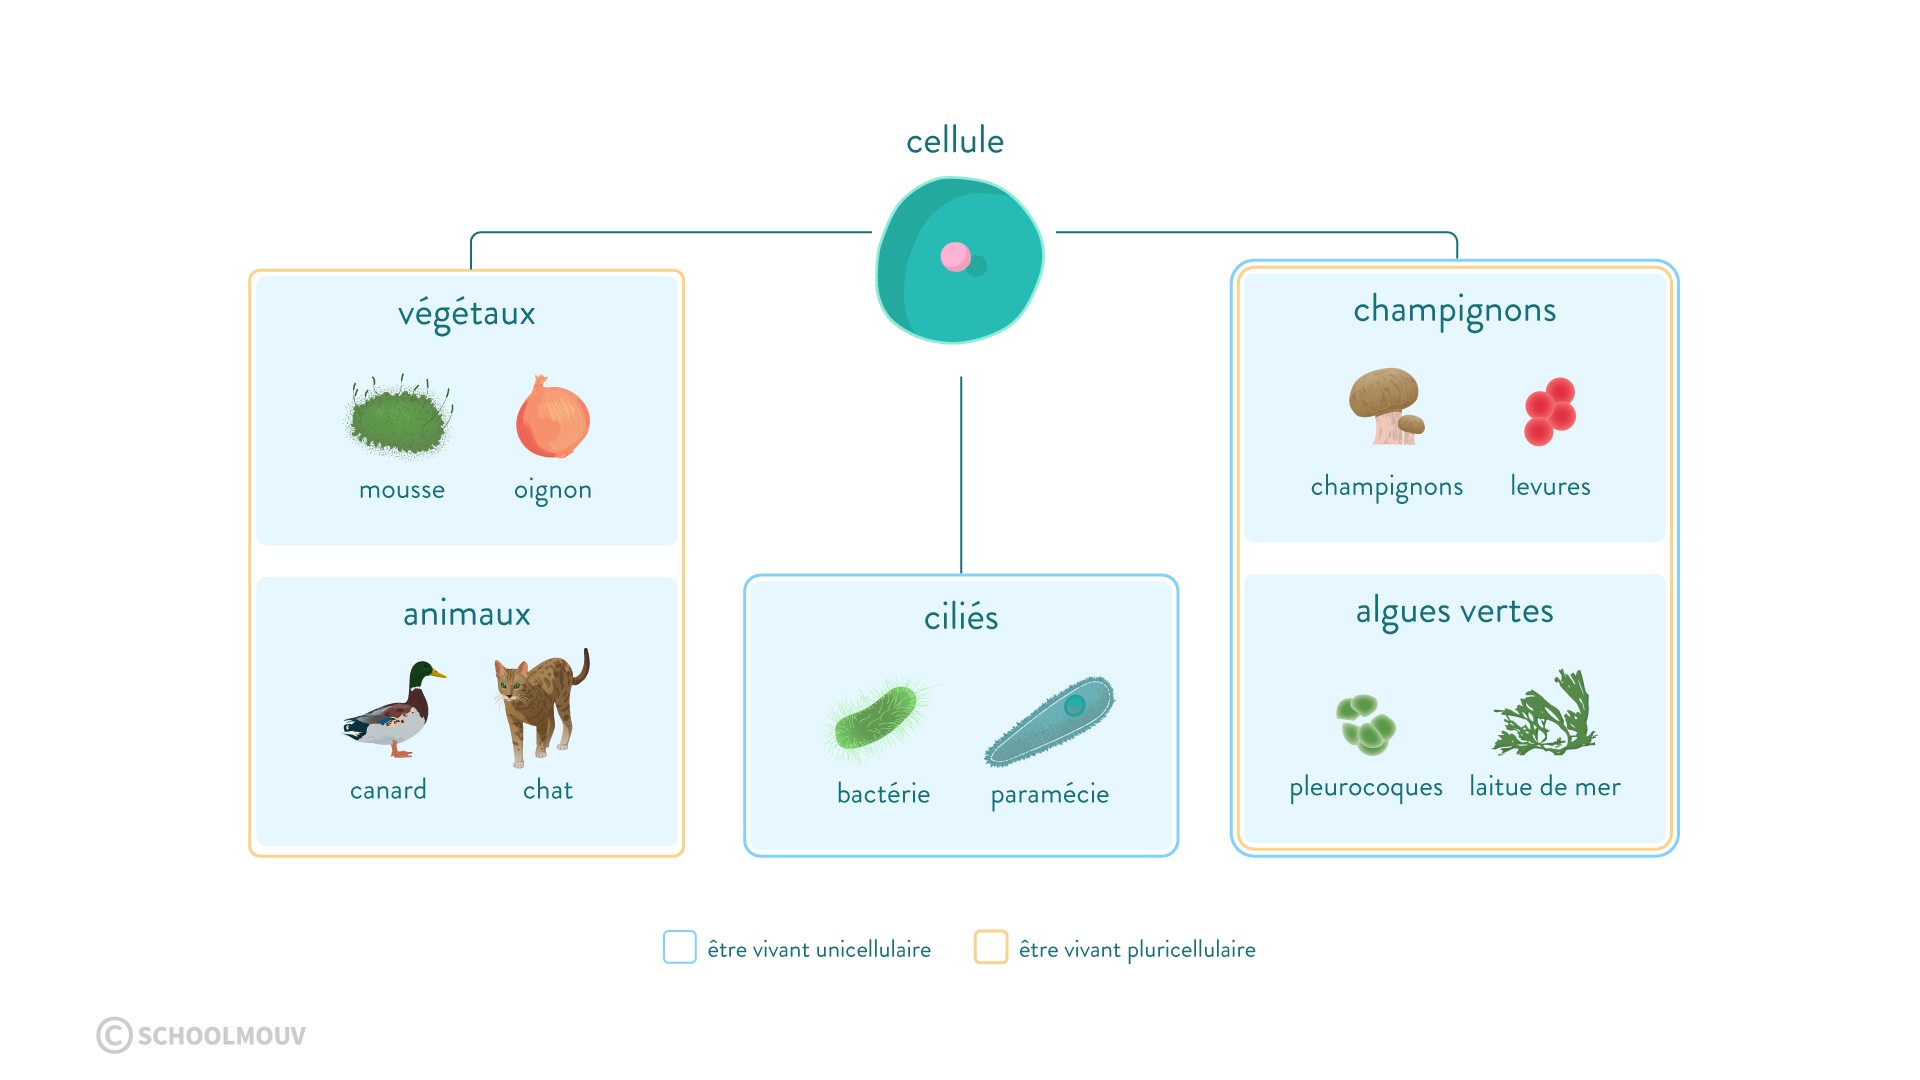 unicellulaires et pluricellulaires